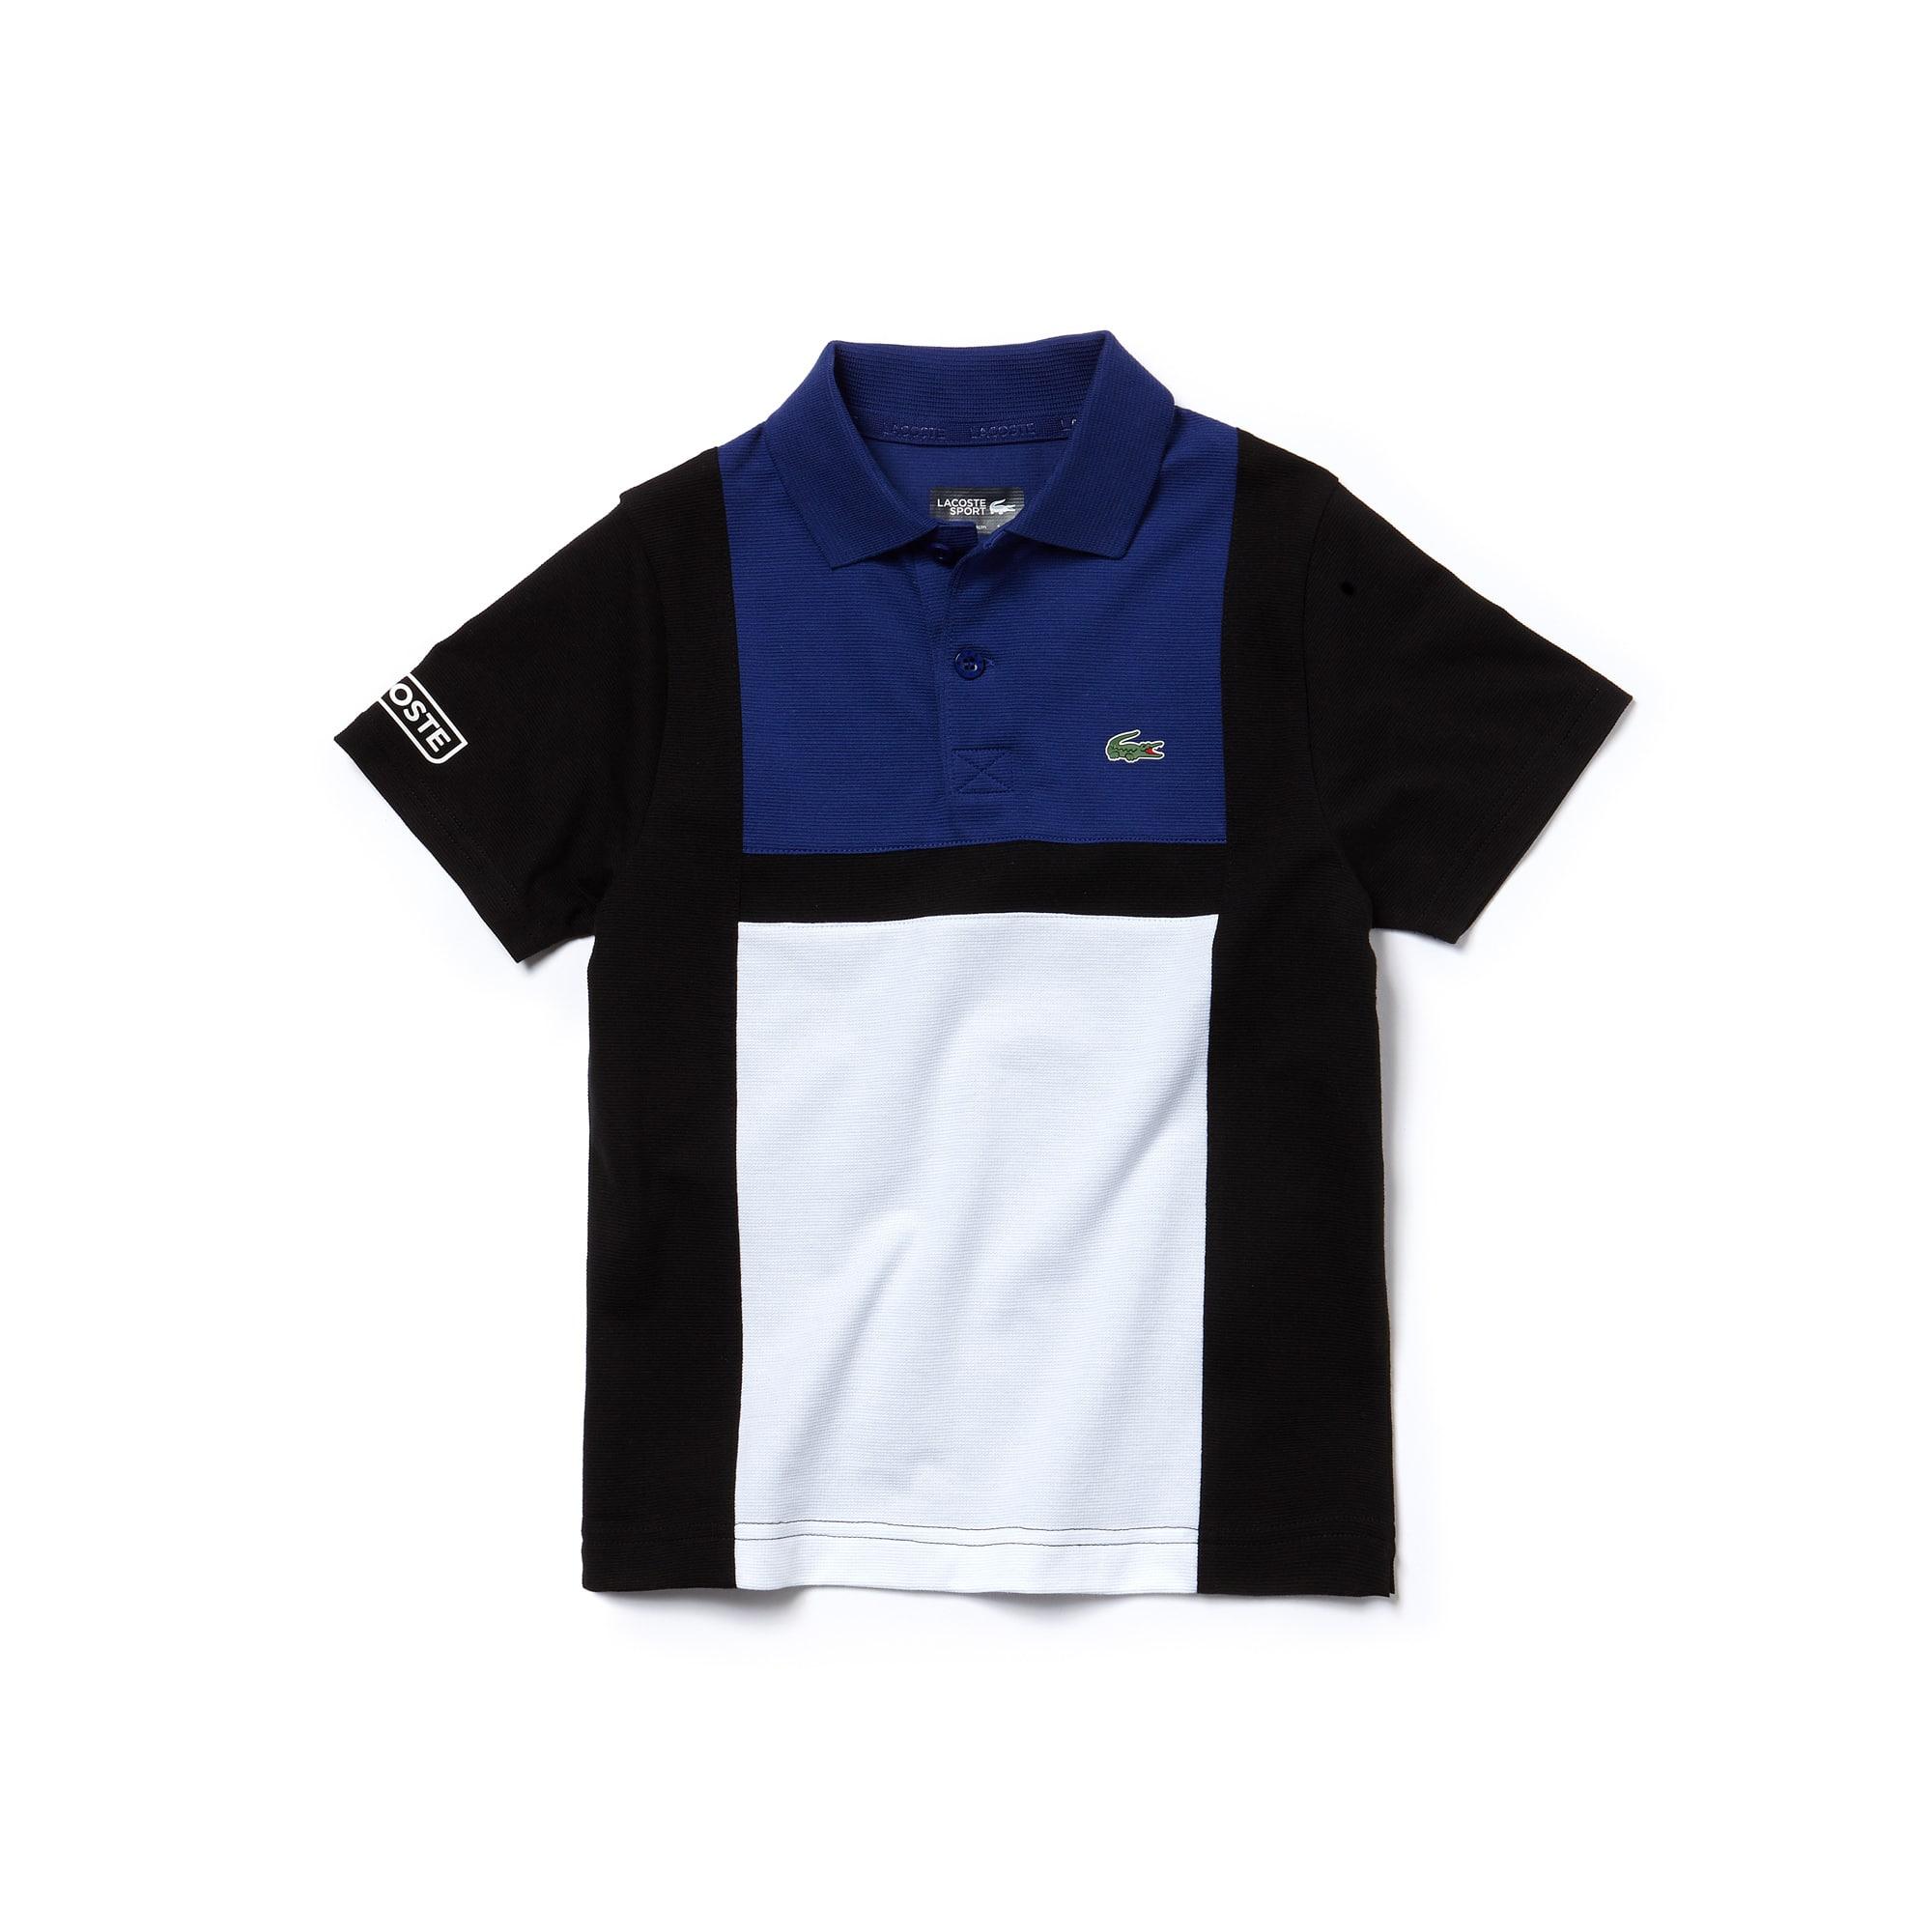 Jungen-Polo aus Baumwolle mit Colorblocks LACOSTE SPORT TENNIS